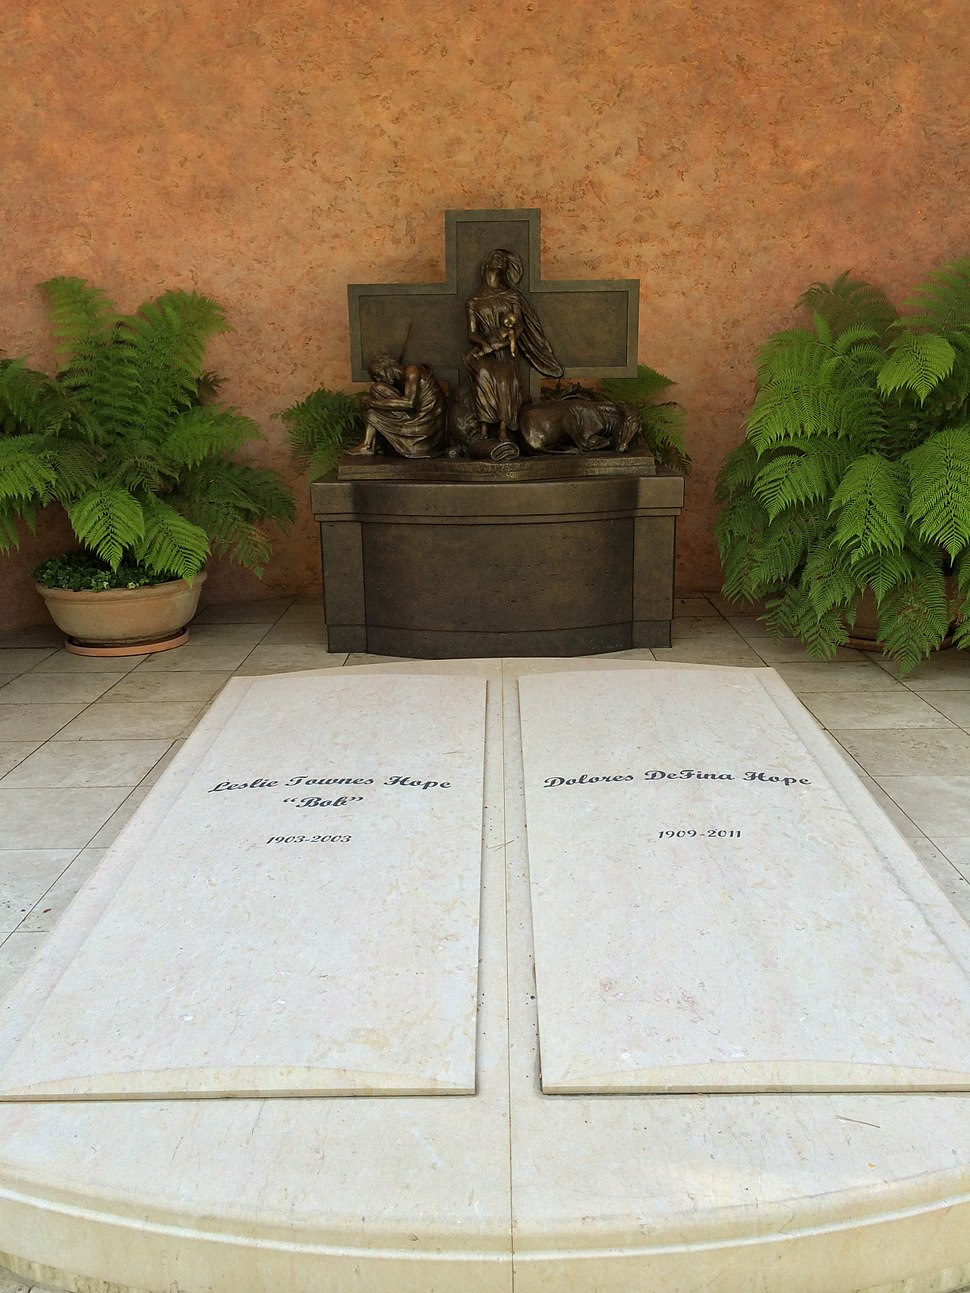 Bob Hope Grave